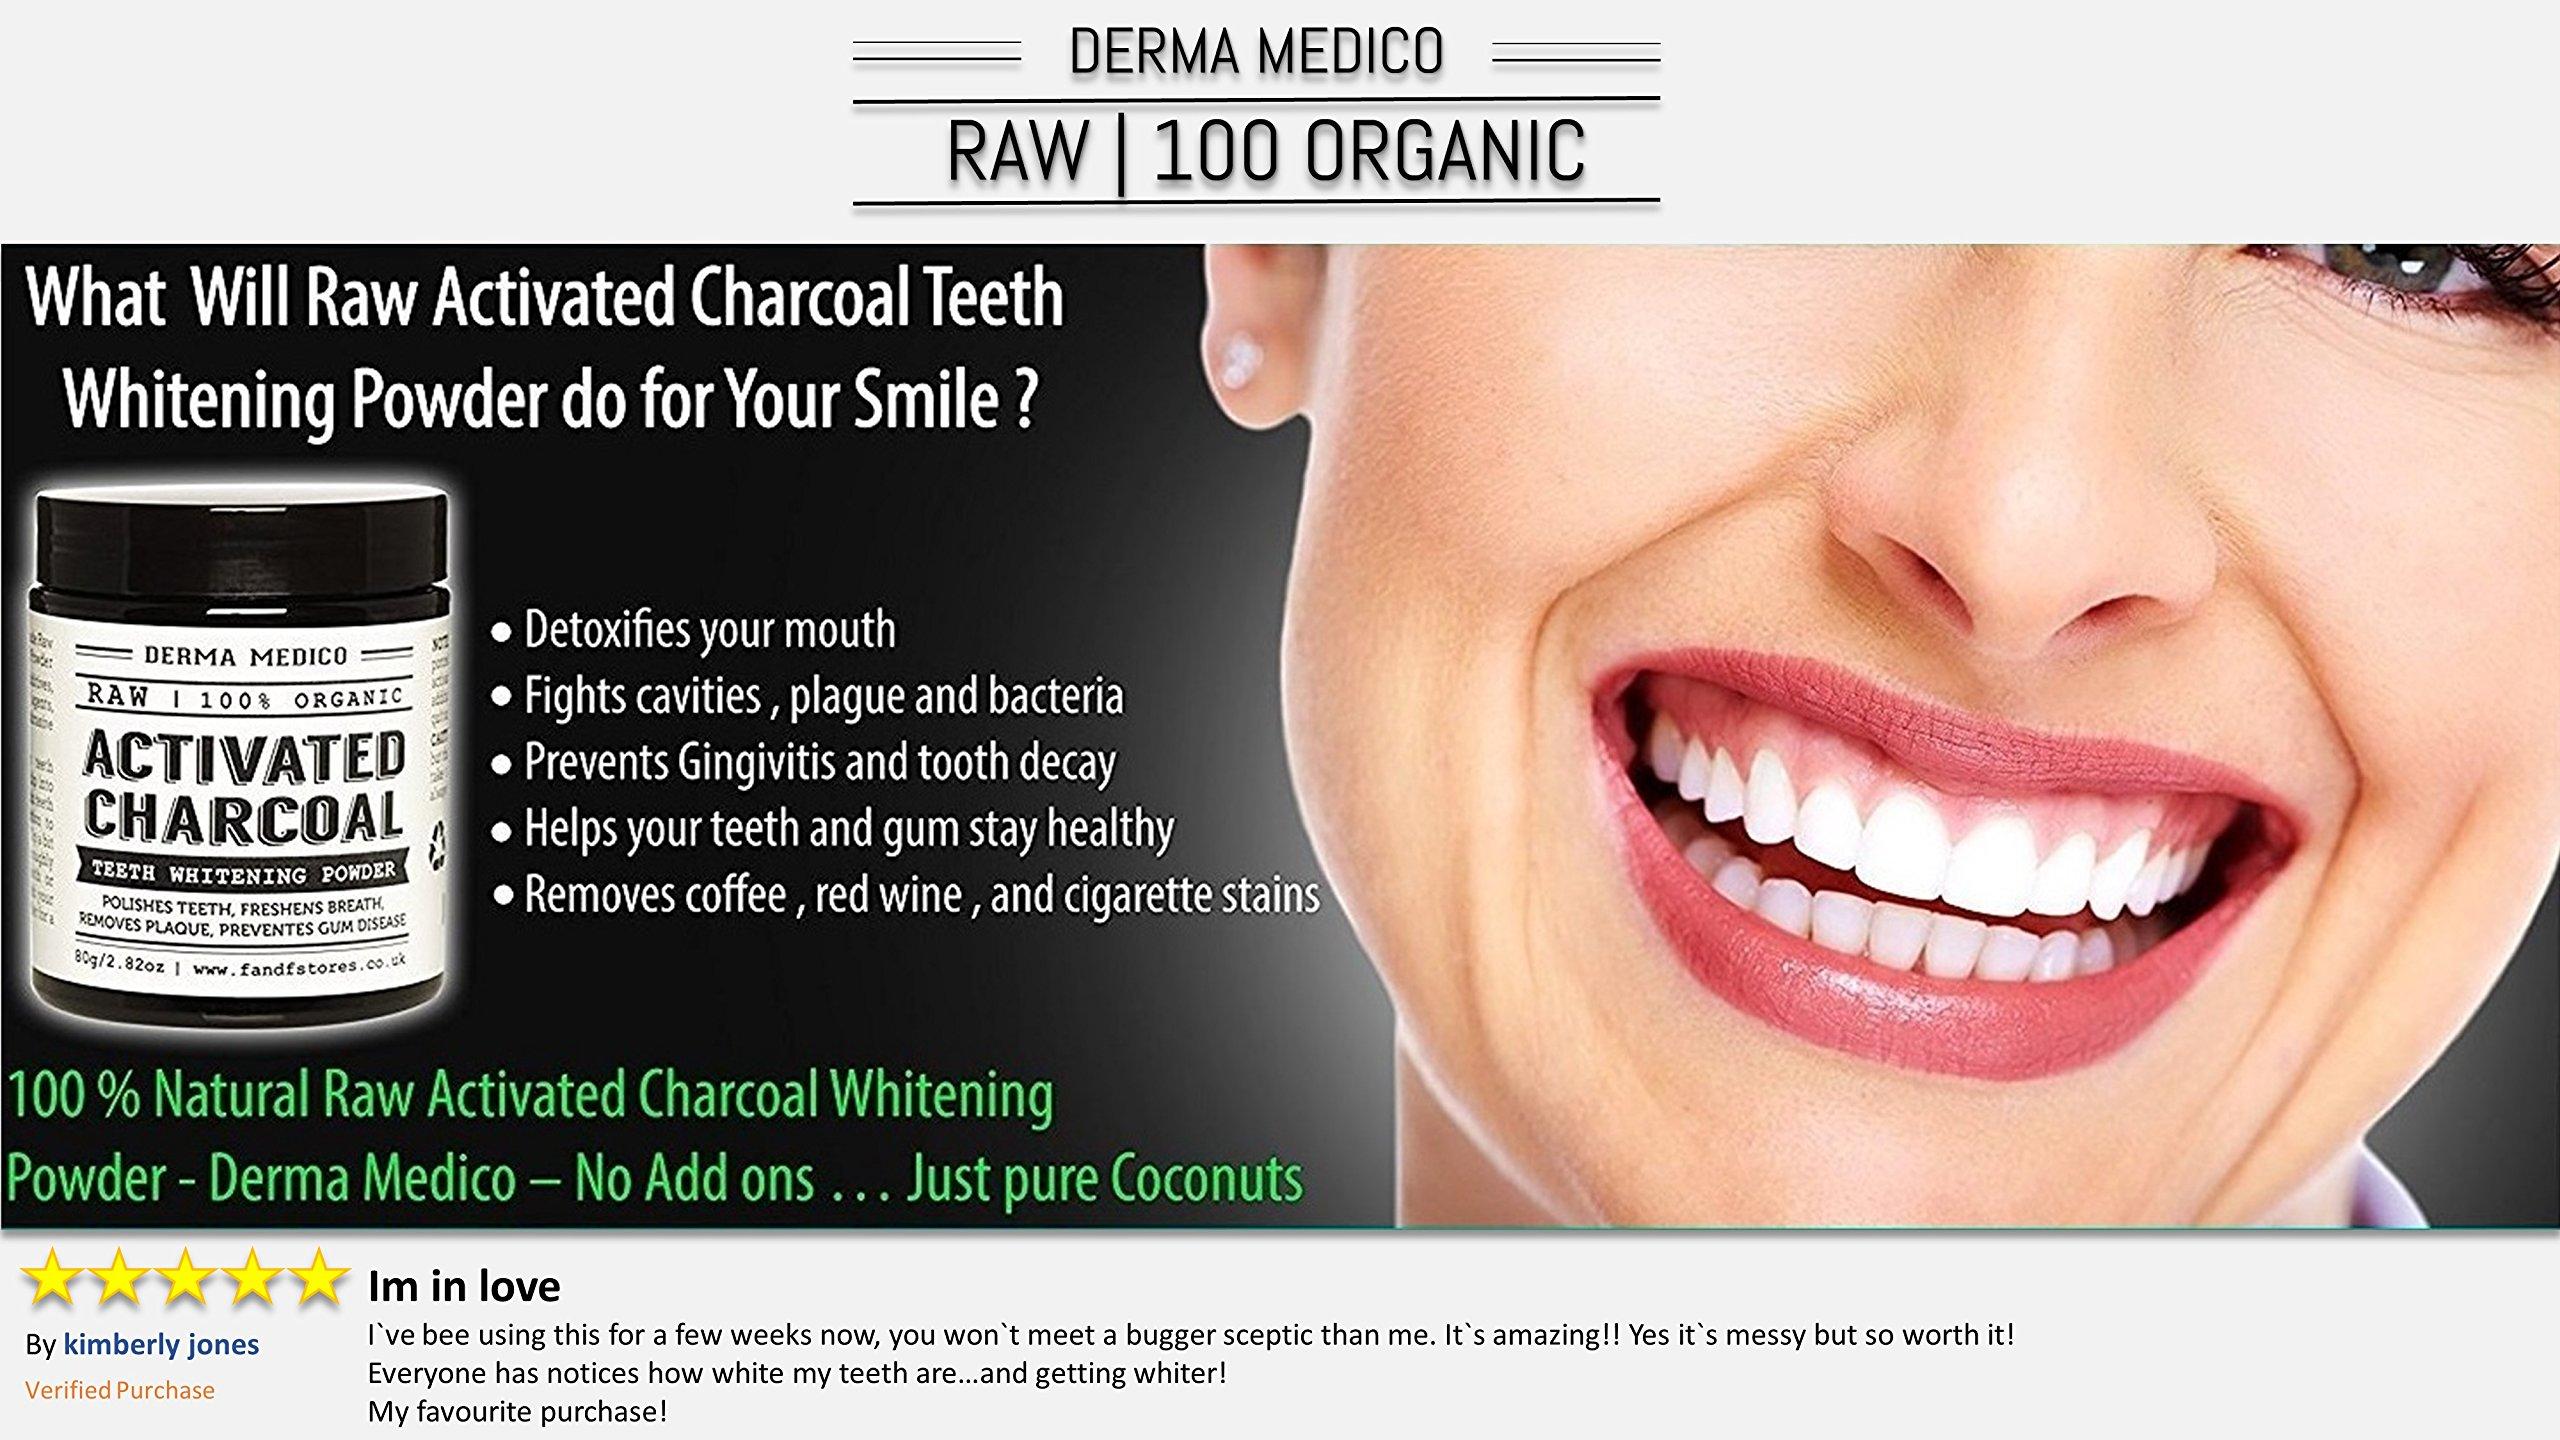 Derma Medico Activated Charcoal Teeth Whitening Powder Raw Coconut Shell by Derma Medico   Polishes Teeth   Freshens Breath   Removes Plaque  